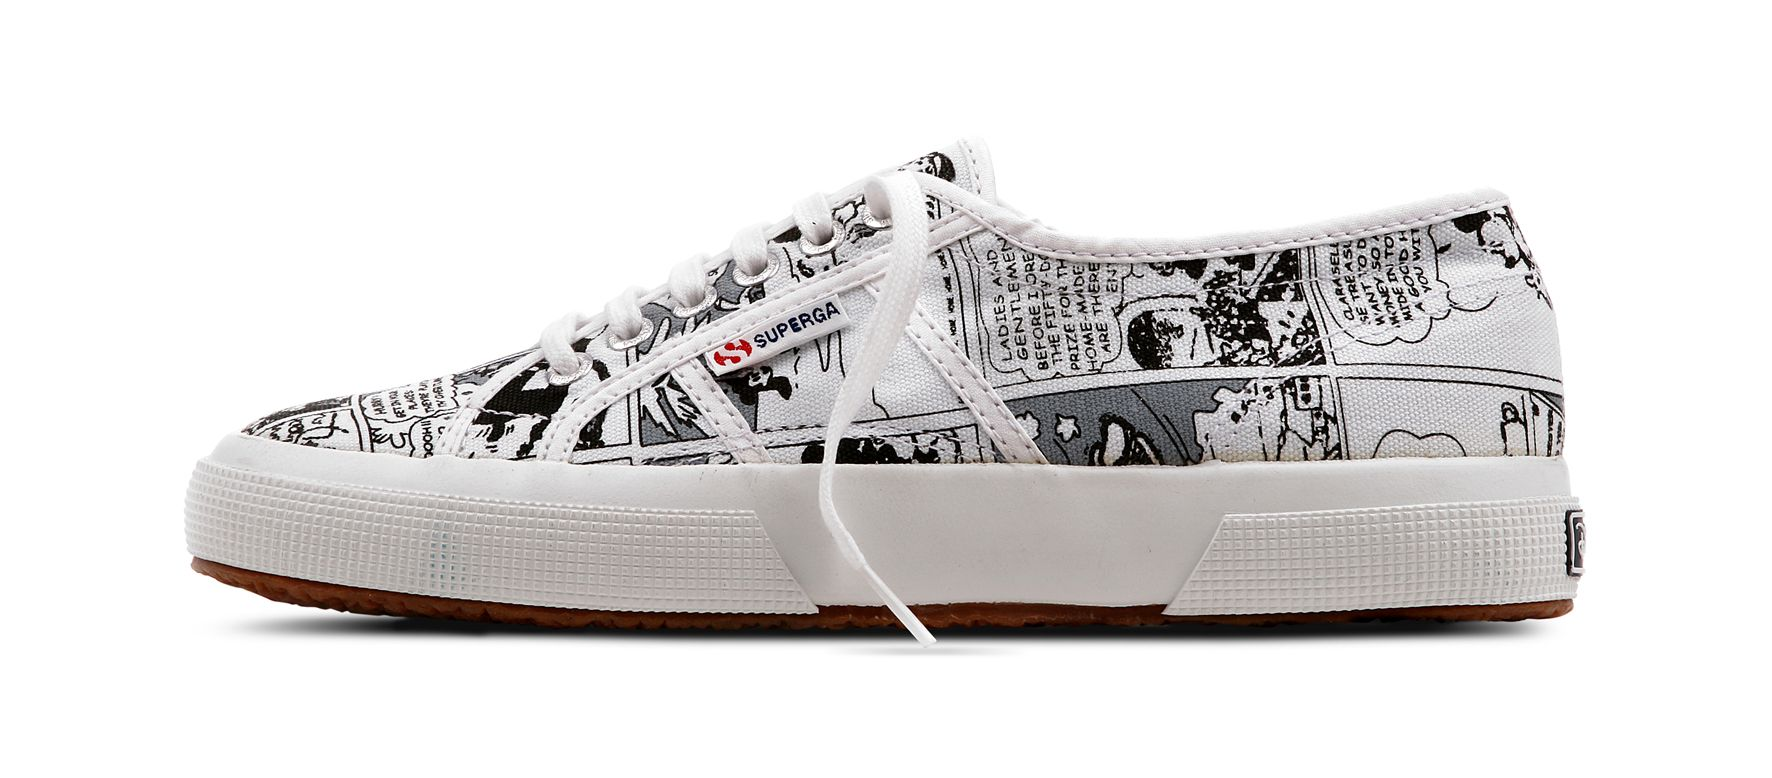 premium selection 3aef8 121b0 Superga #sneakers #shoes #superga #disney | ___SneakerS___ ...